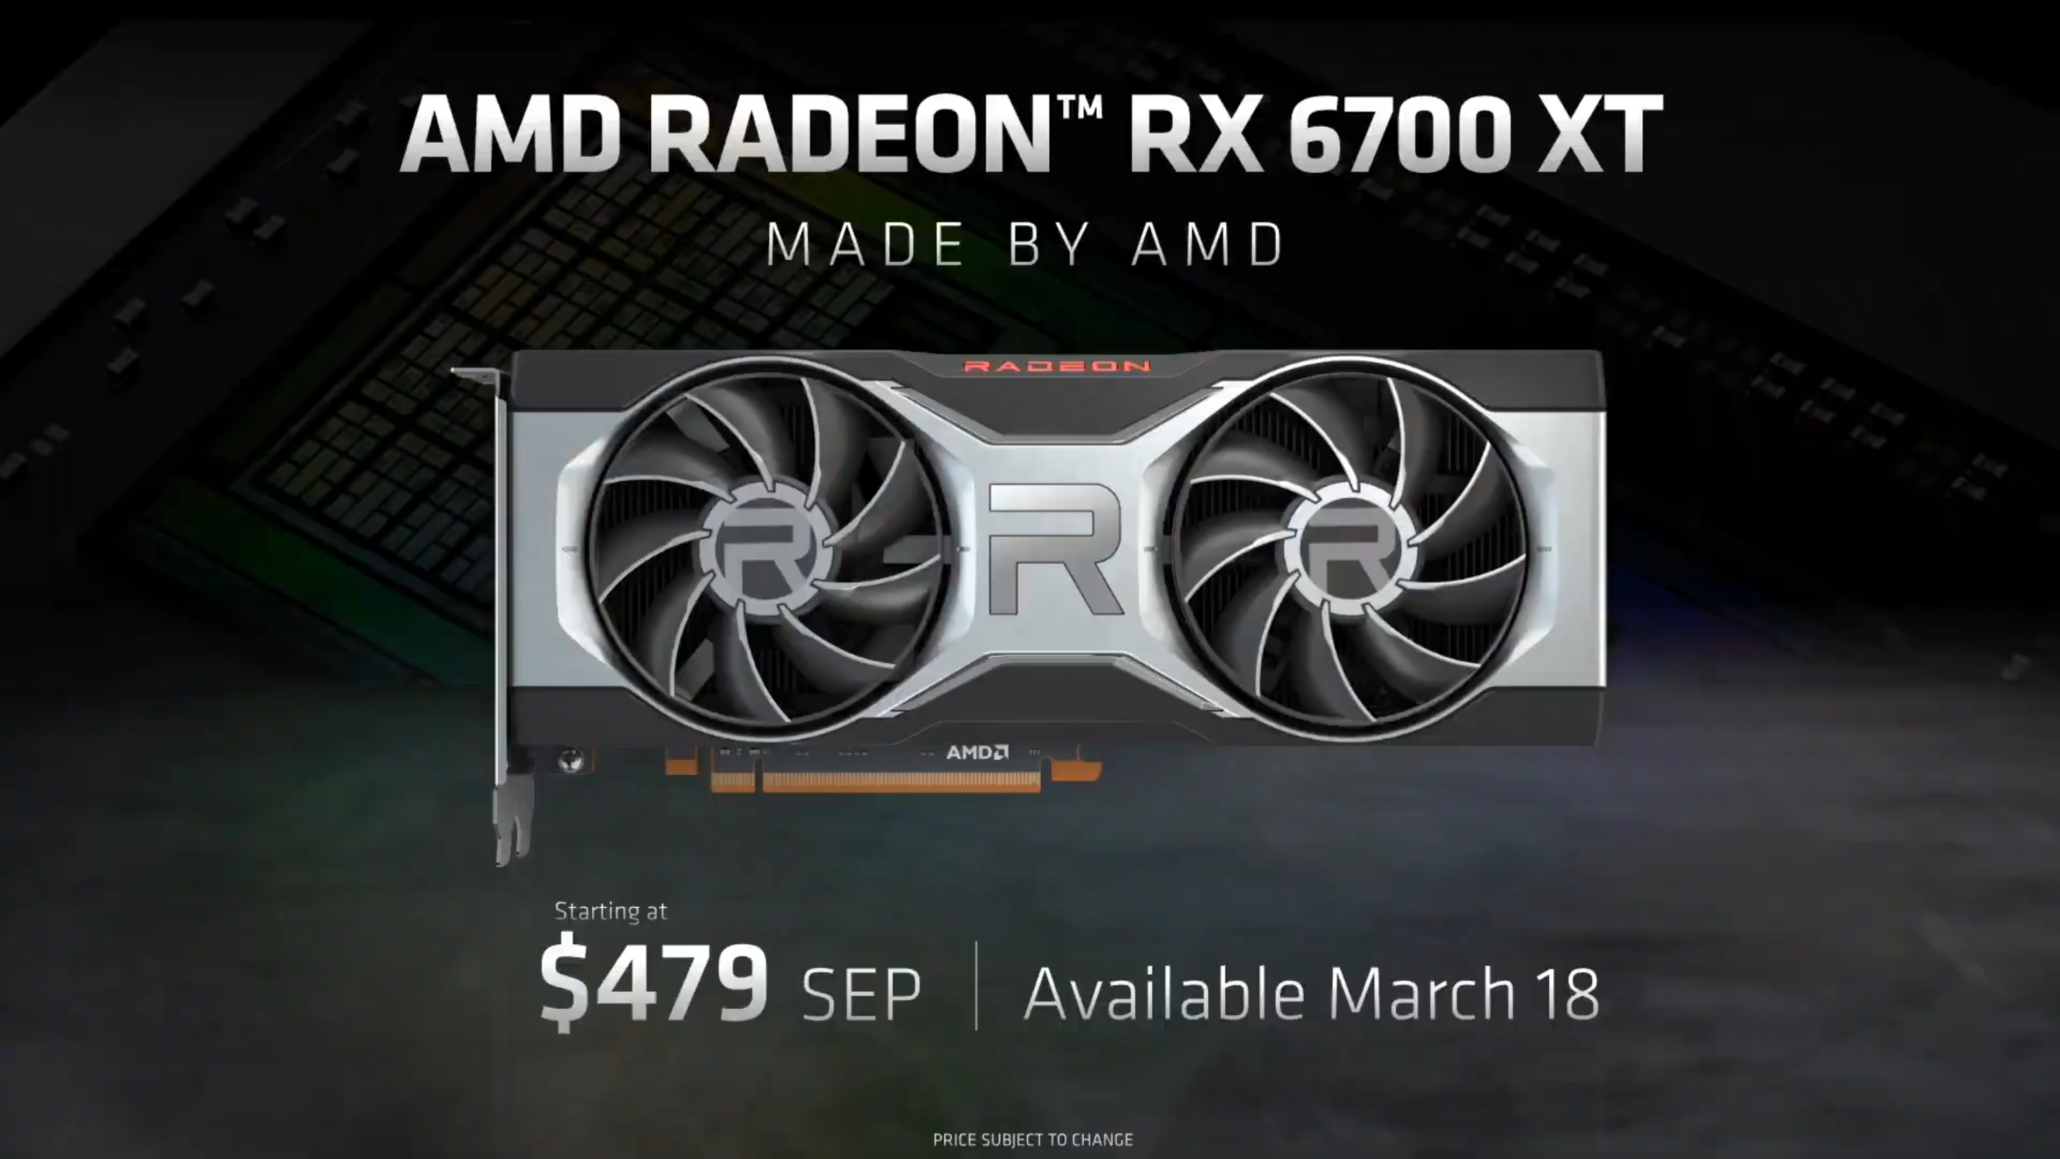 amd-radeon-rx-6700-xt-12-gb-graphics-card-rnda-2-gpu-unveil-_launch-price-_1